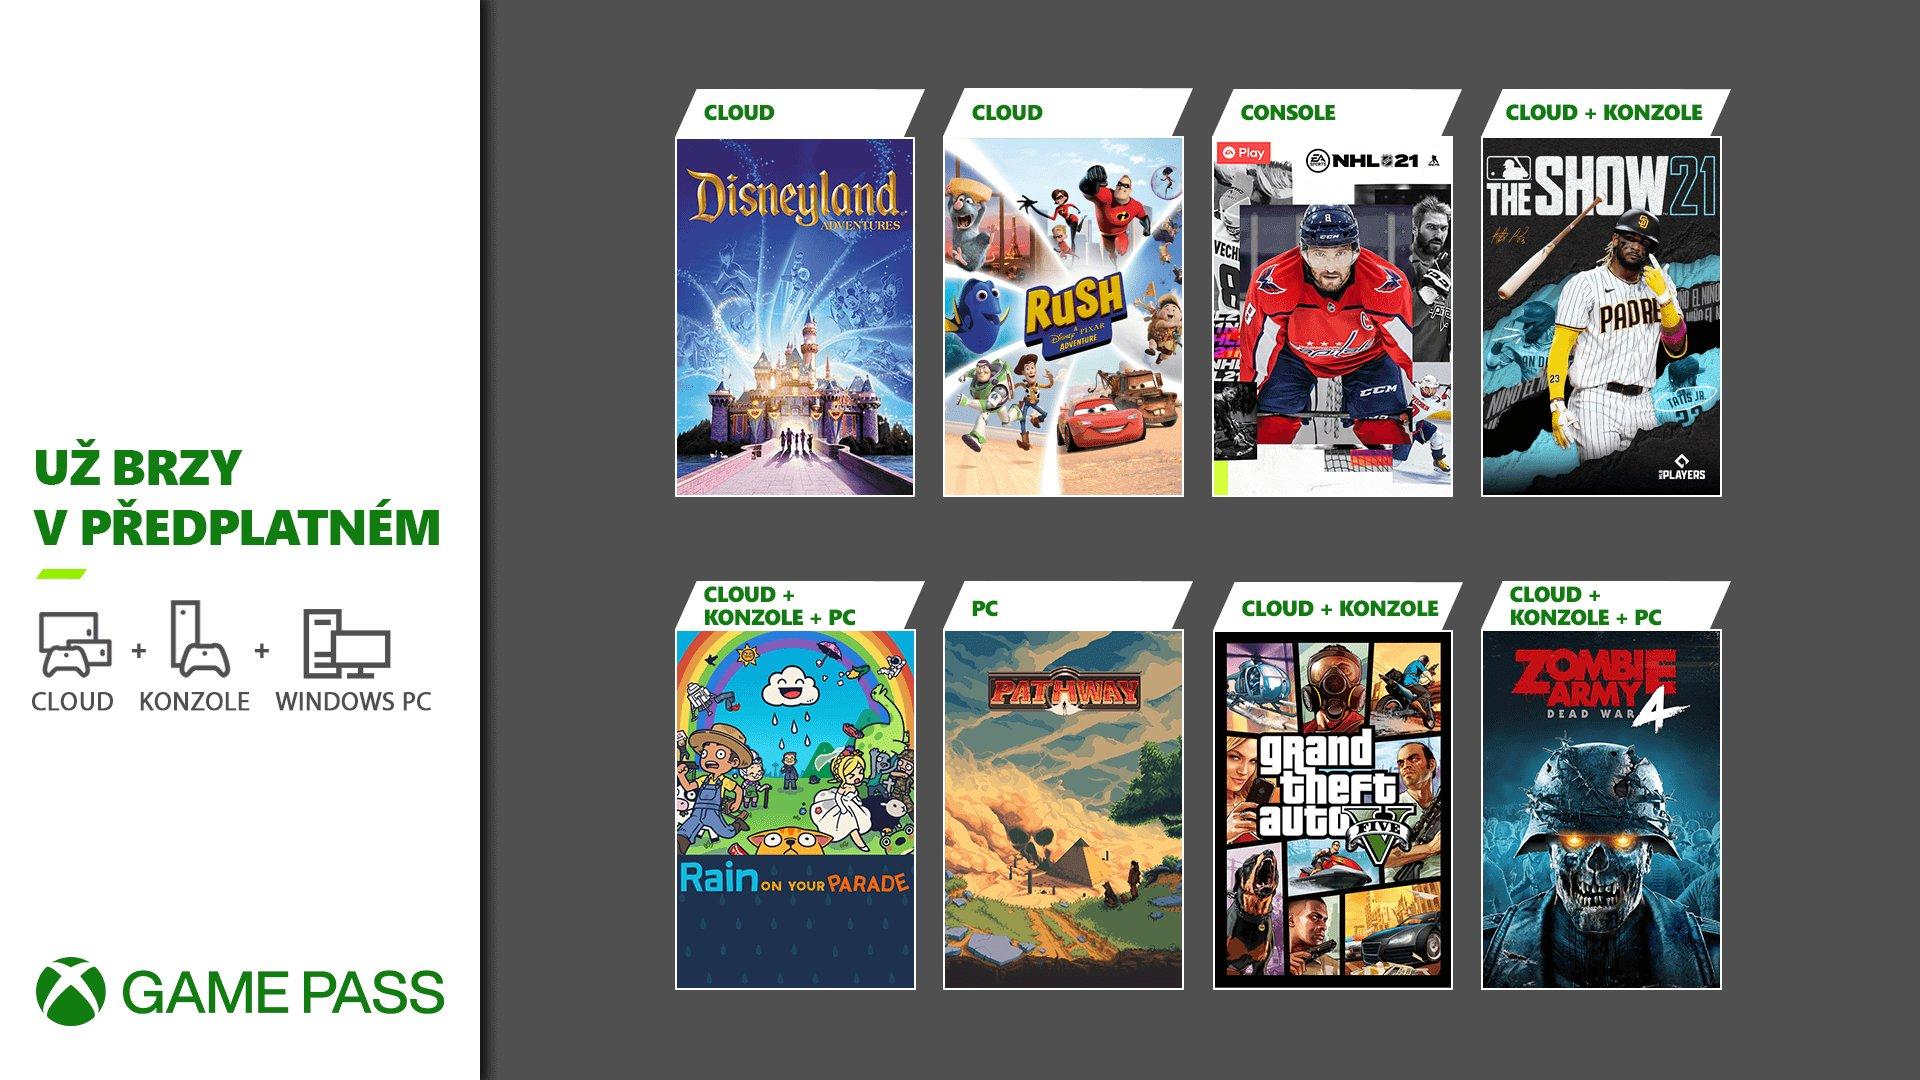 GTA V se vrací do Xbox Game Pass game passcz